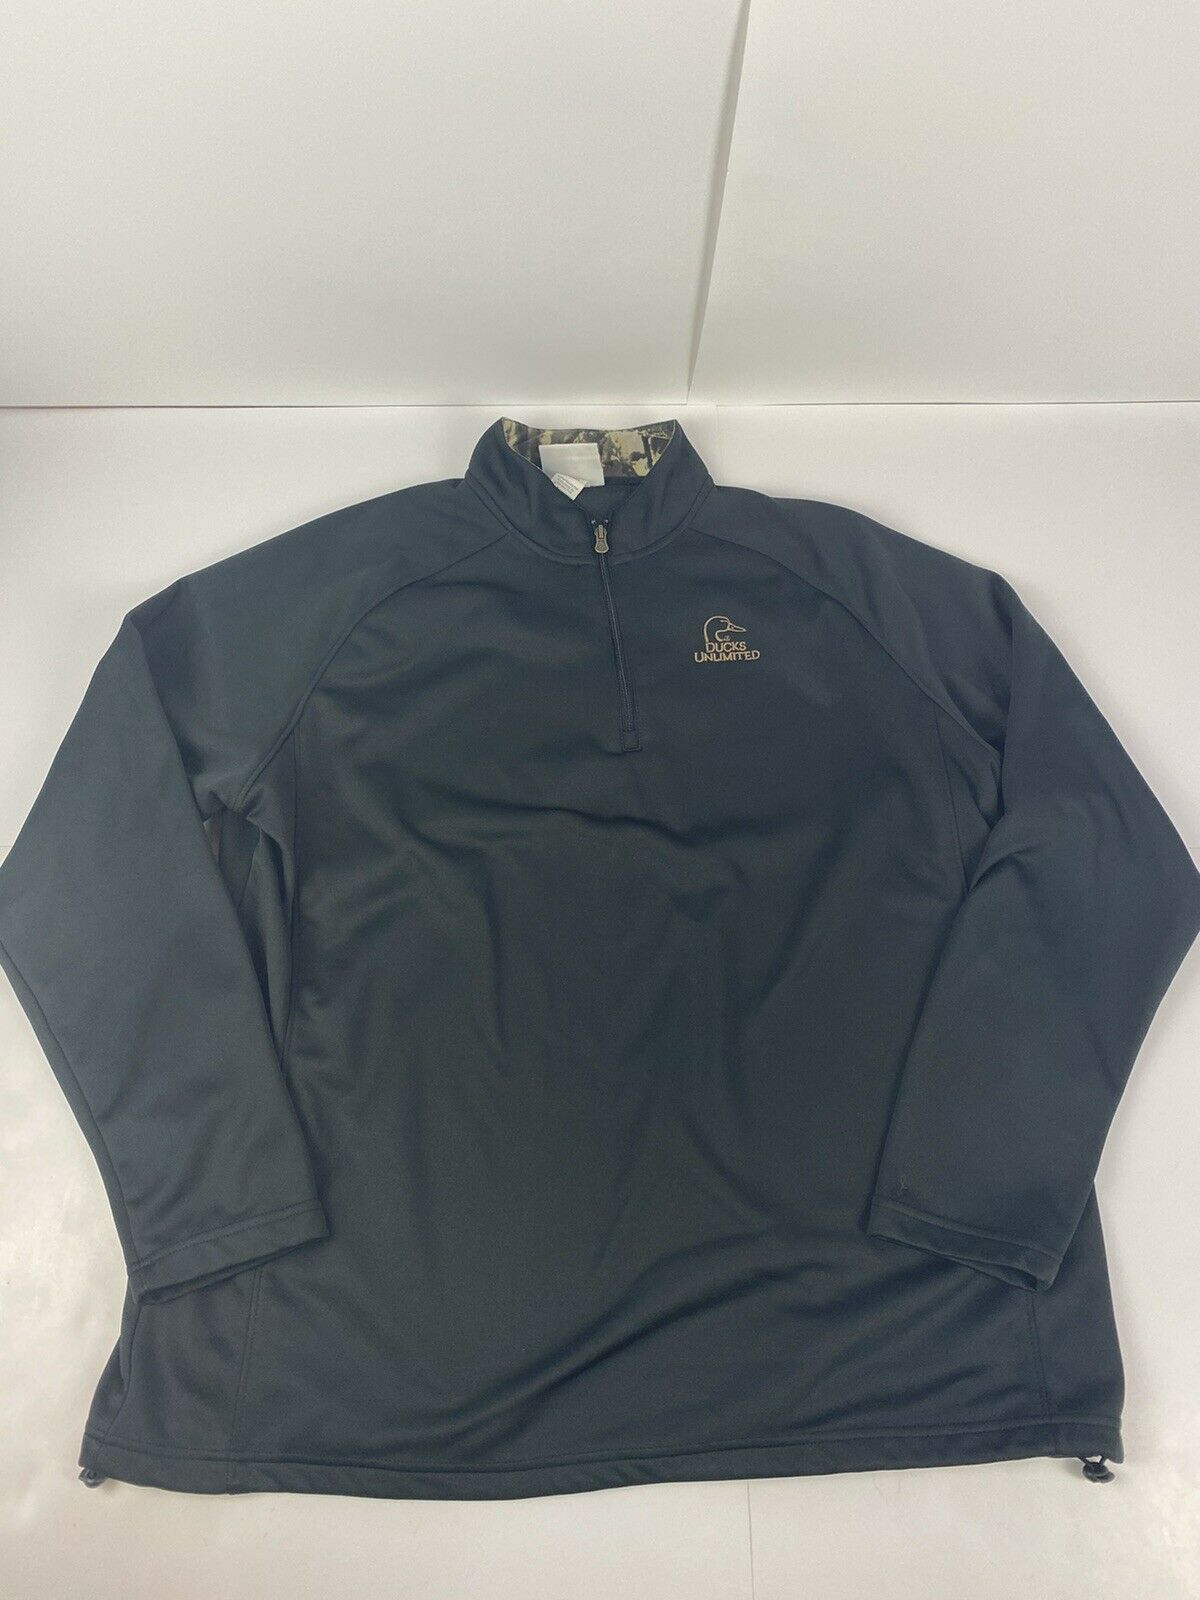 Ducks Unlimited 75th Anniversary Men's 1/4 Zip Pullover, Color: Black, Size XL